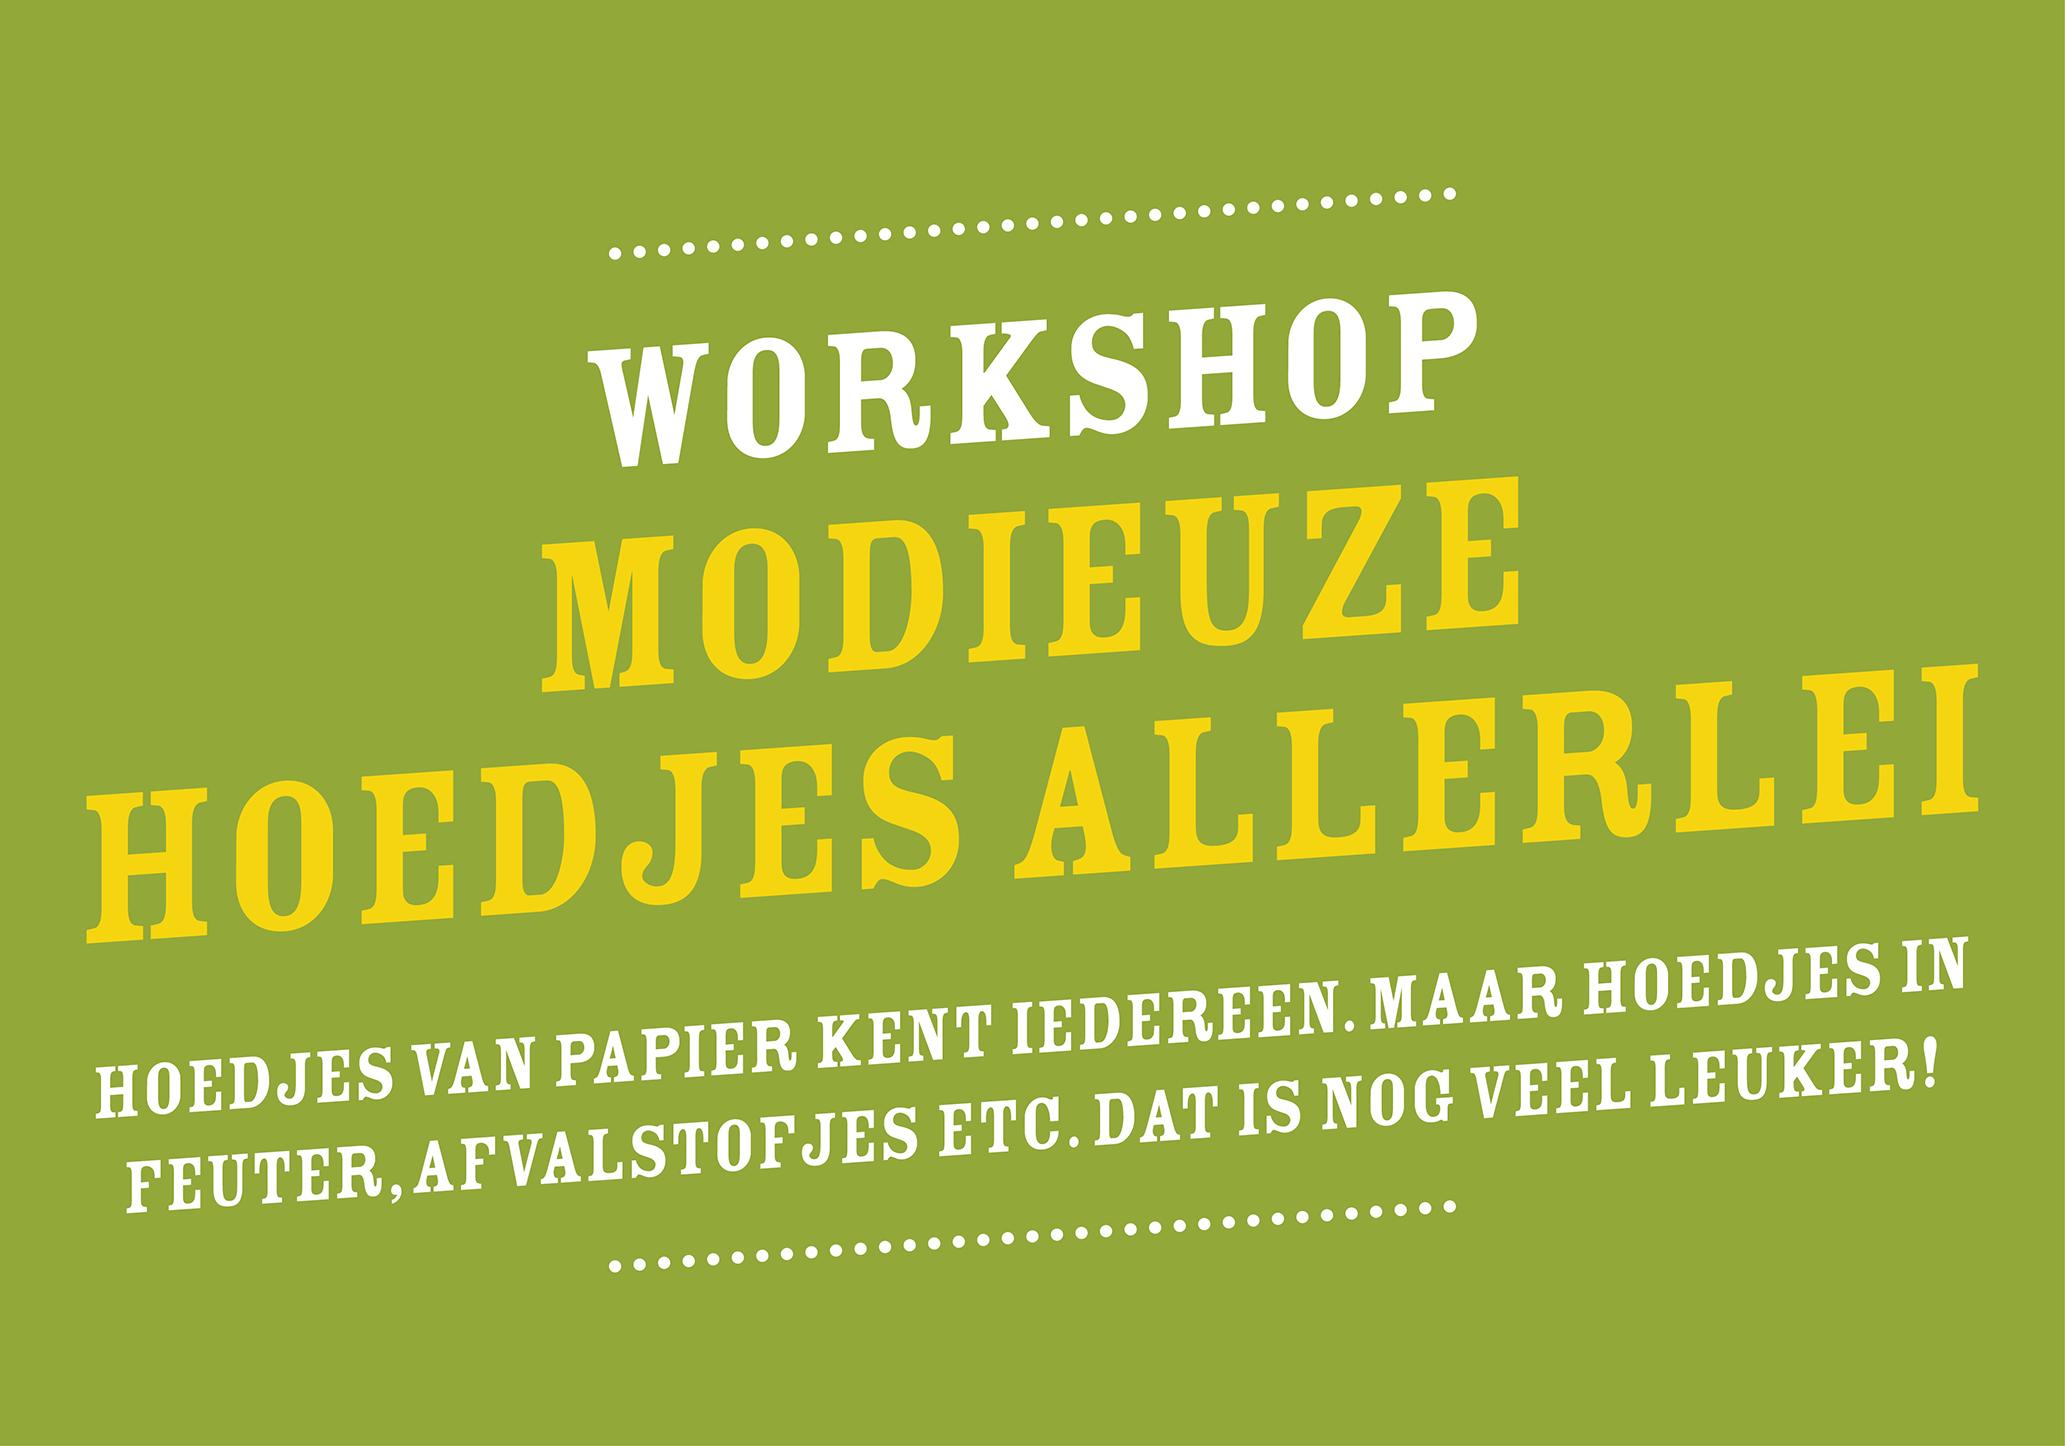 Look_Smile-workshop-modieuze_hoedjes_allerlei